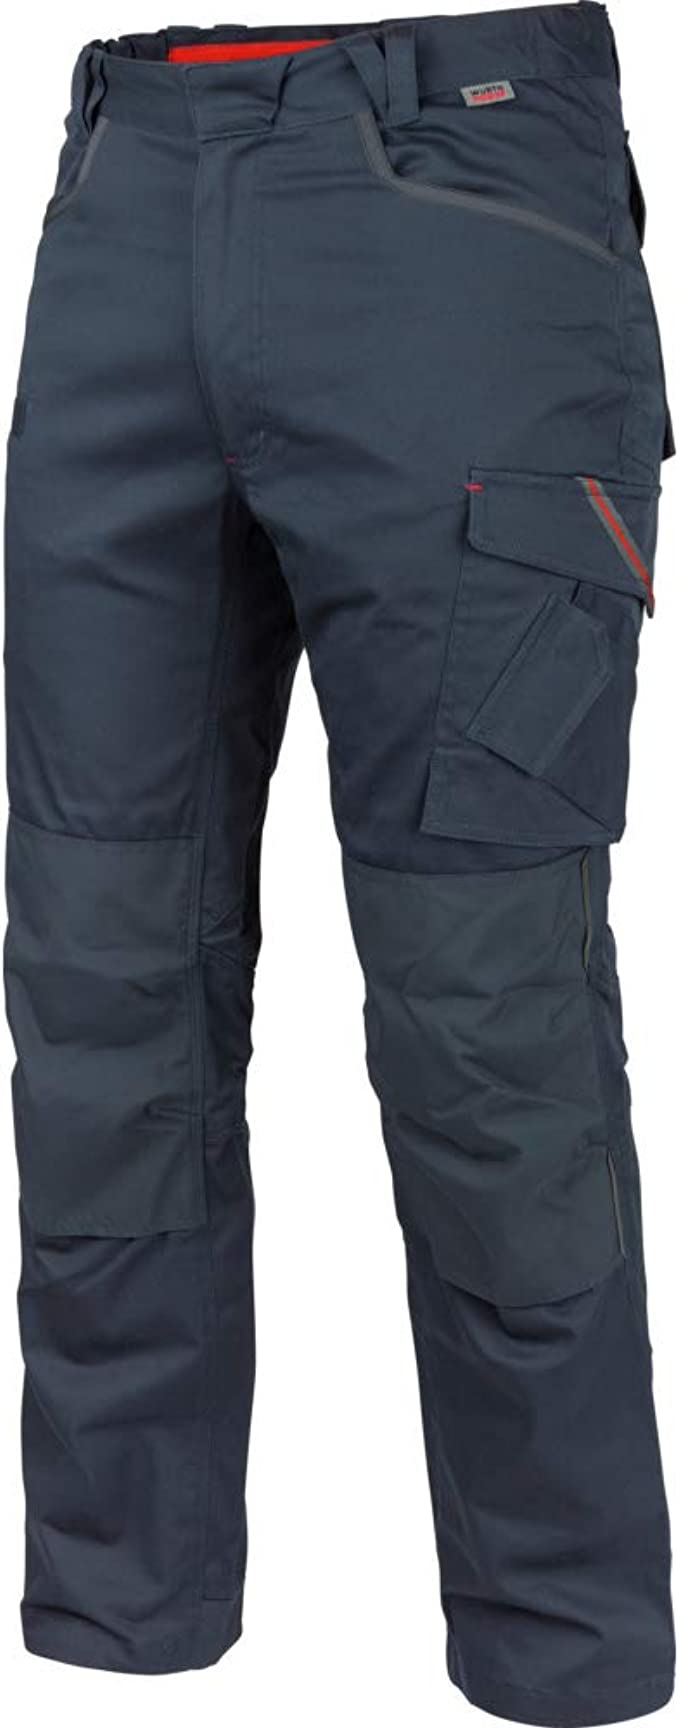 W/ÜRTH MODYF Pantalon de Travail Stretch X Marine